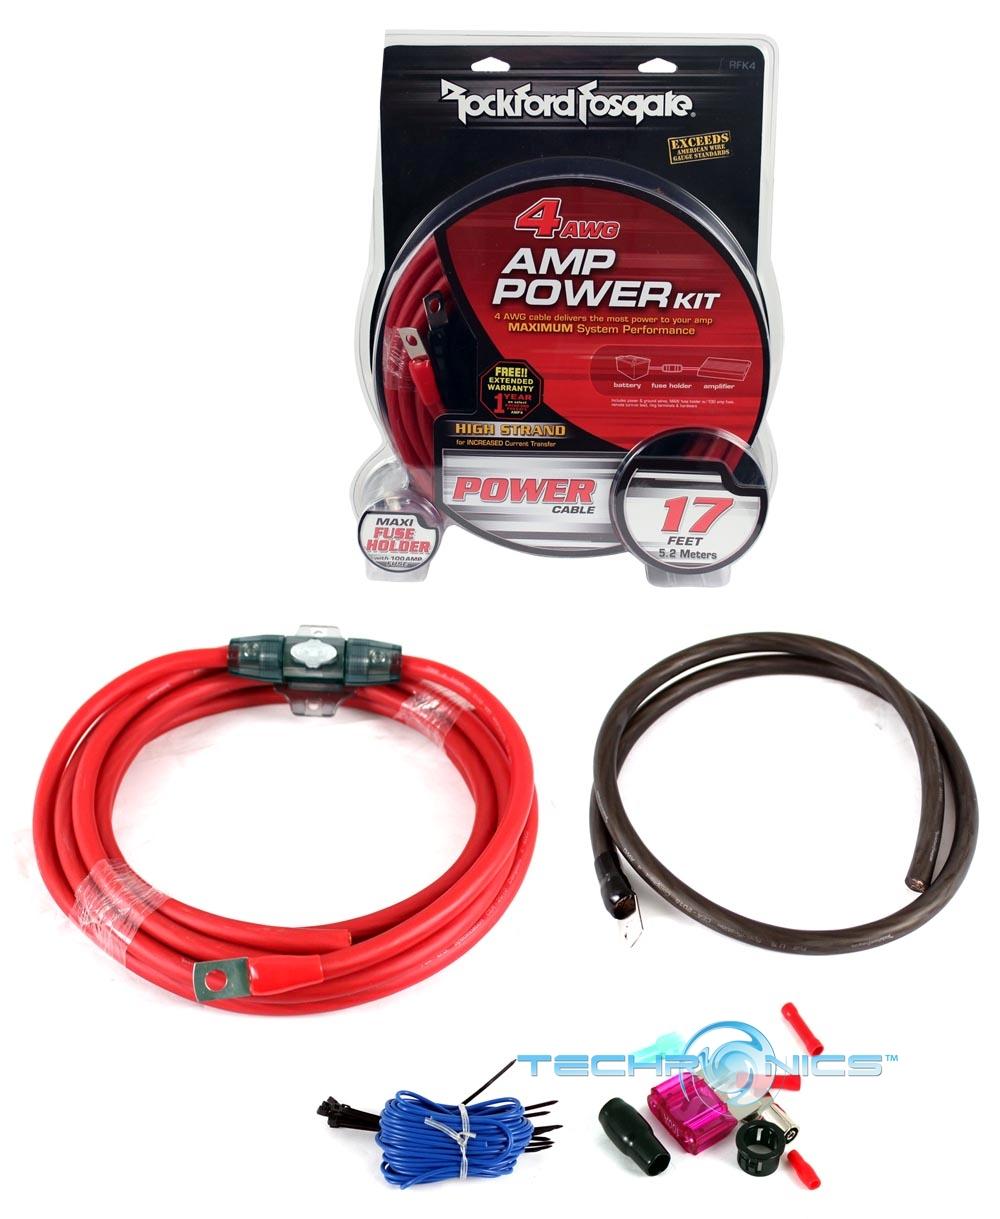 rockford fosgate rfk4 4 awg car amplifier power installation wiring kit